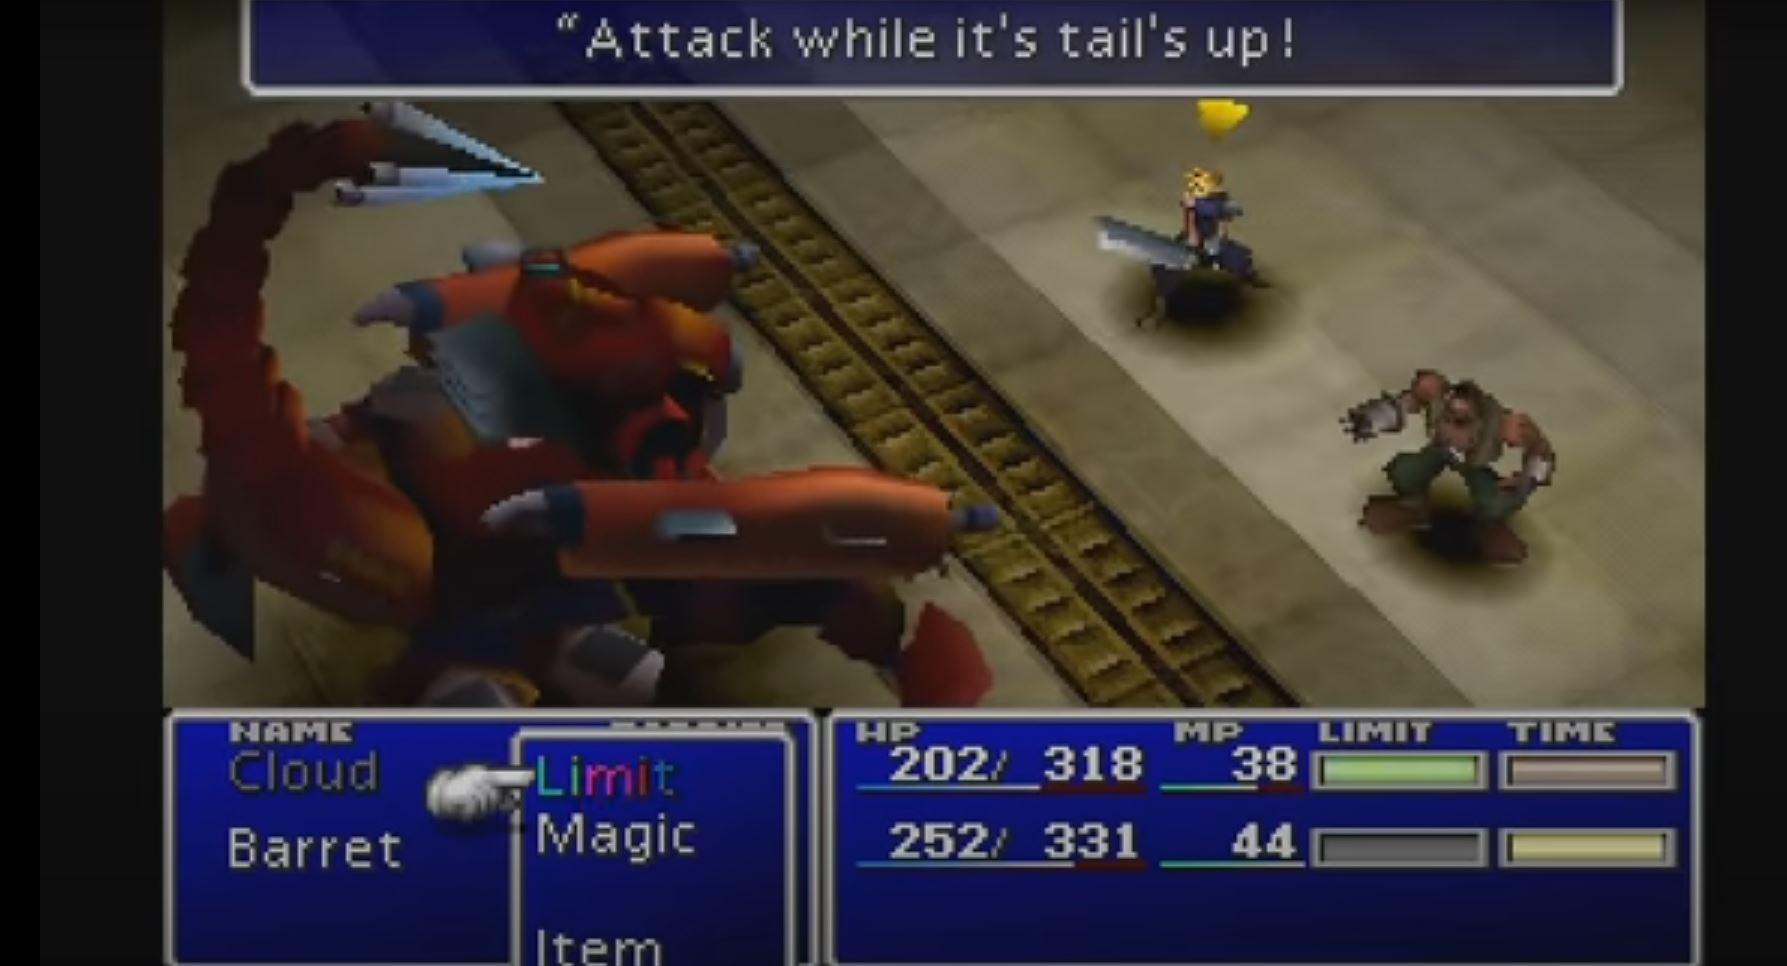 Final Fantasy 7: Kampfbildschirm